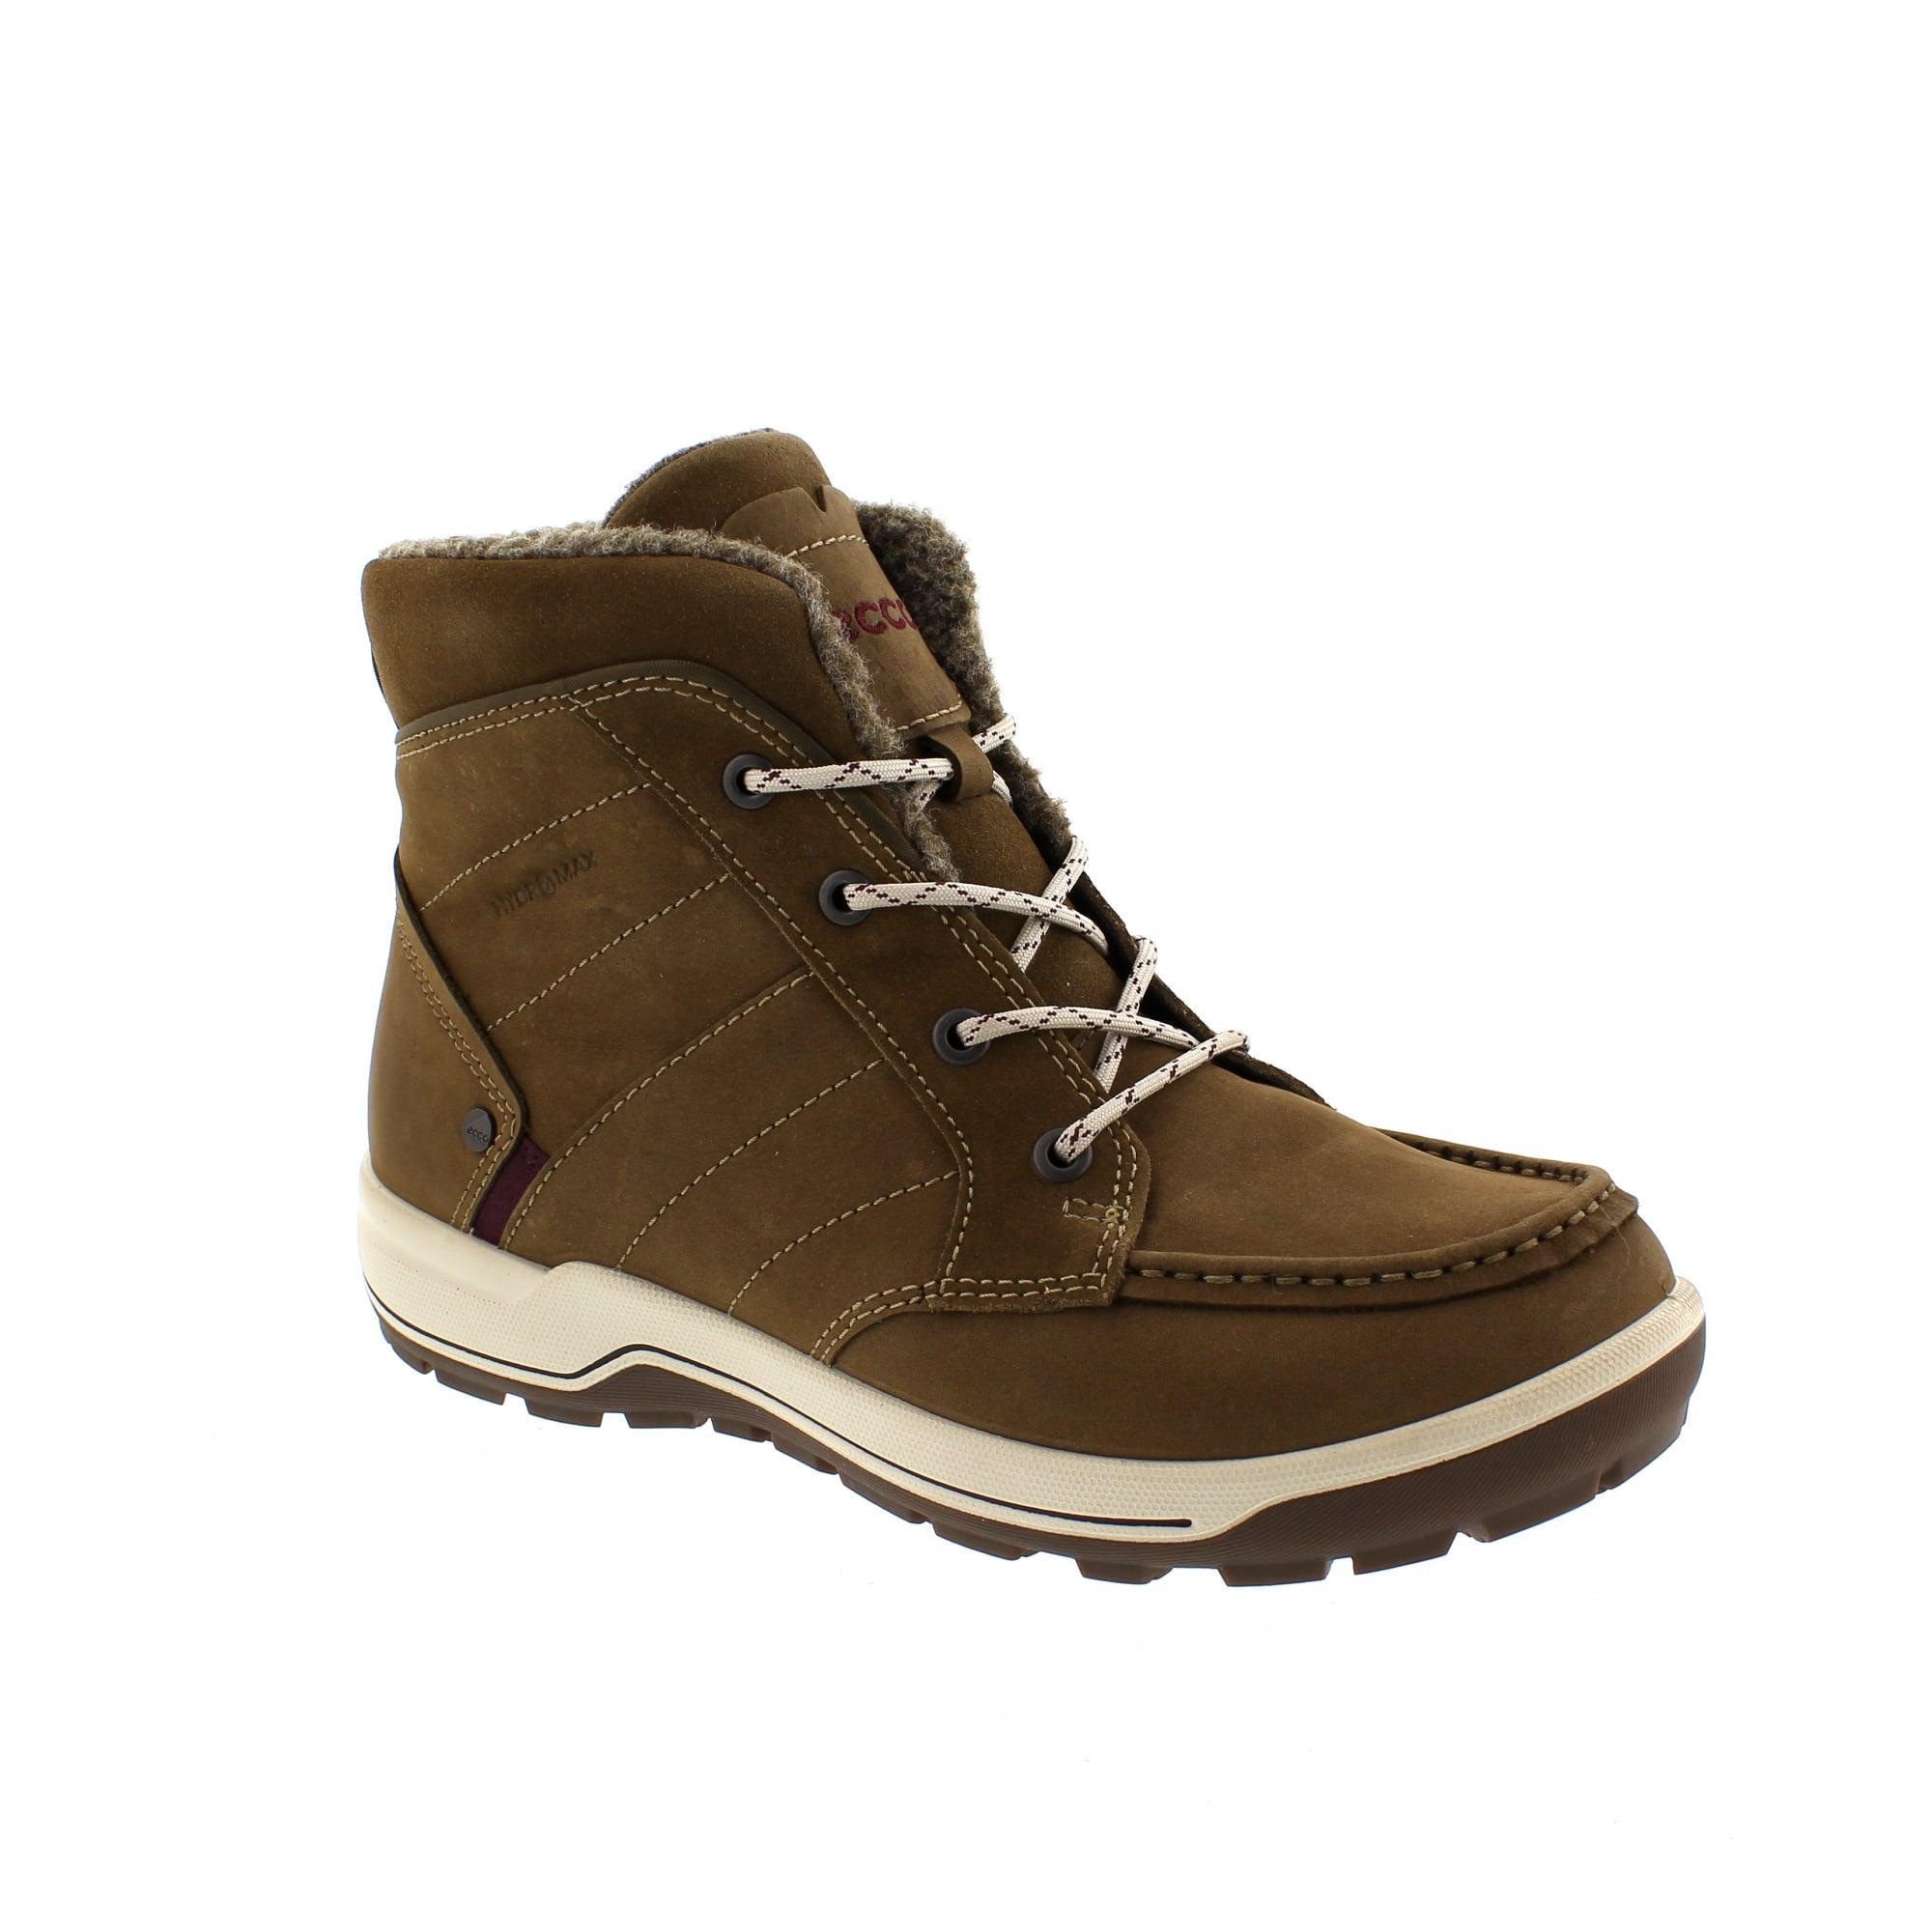 4e208608b114 Ecco Trace Lite 832113-58720 Womens Walking Boots